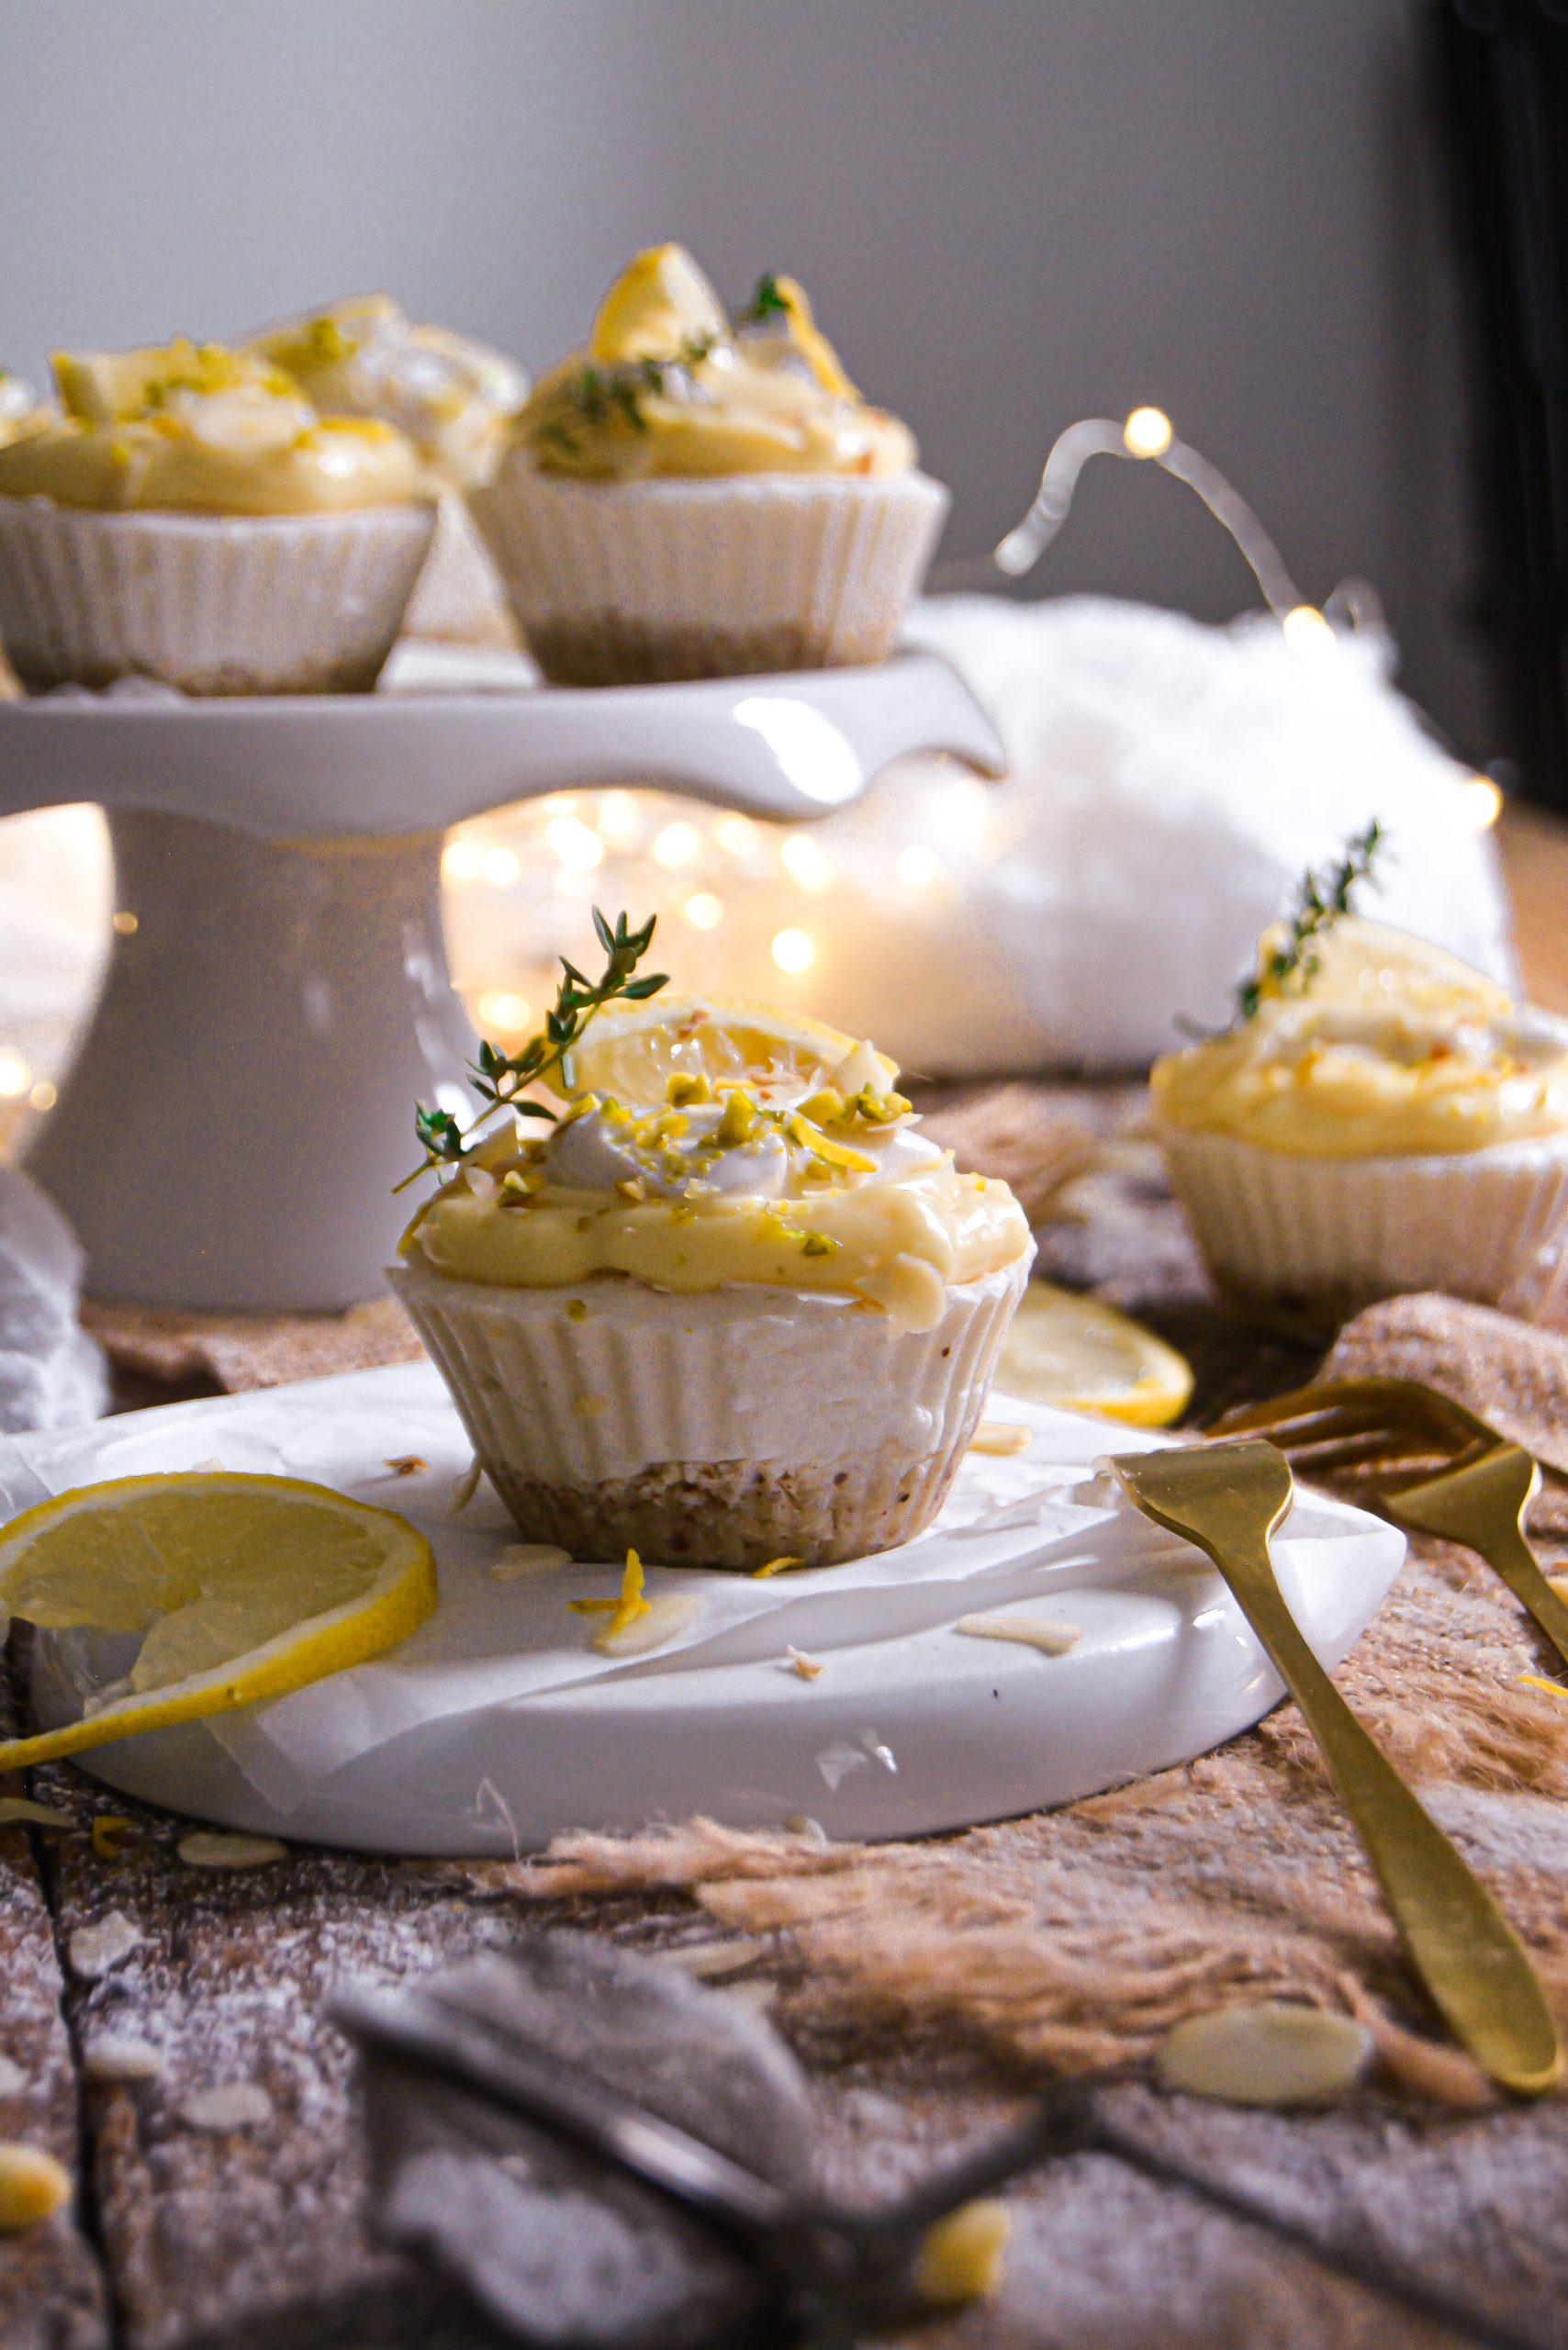 Mini Cheesecakes Vegan Sans Gluten au Citron / Mini Vegan Gluten Free Lemon Cheesecakes